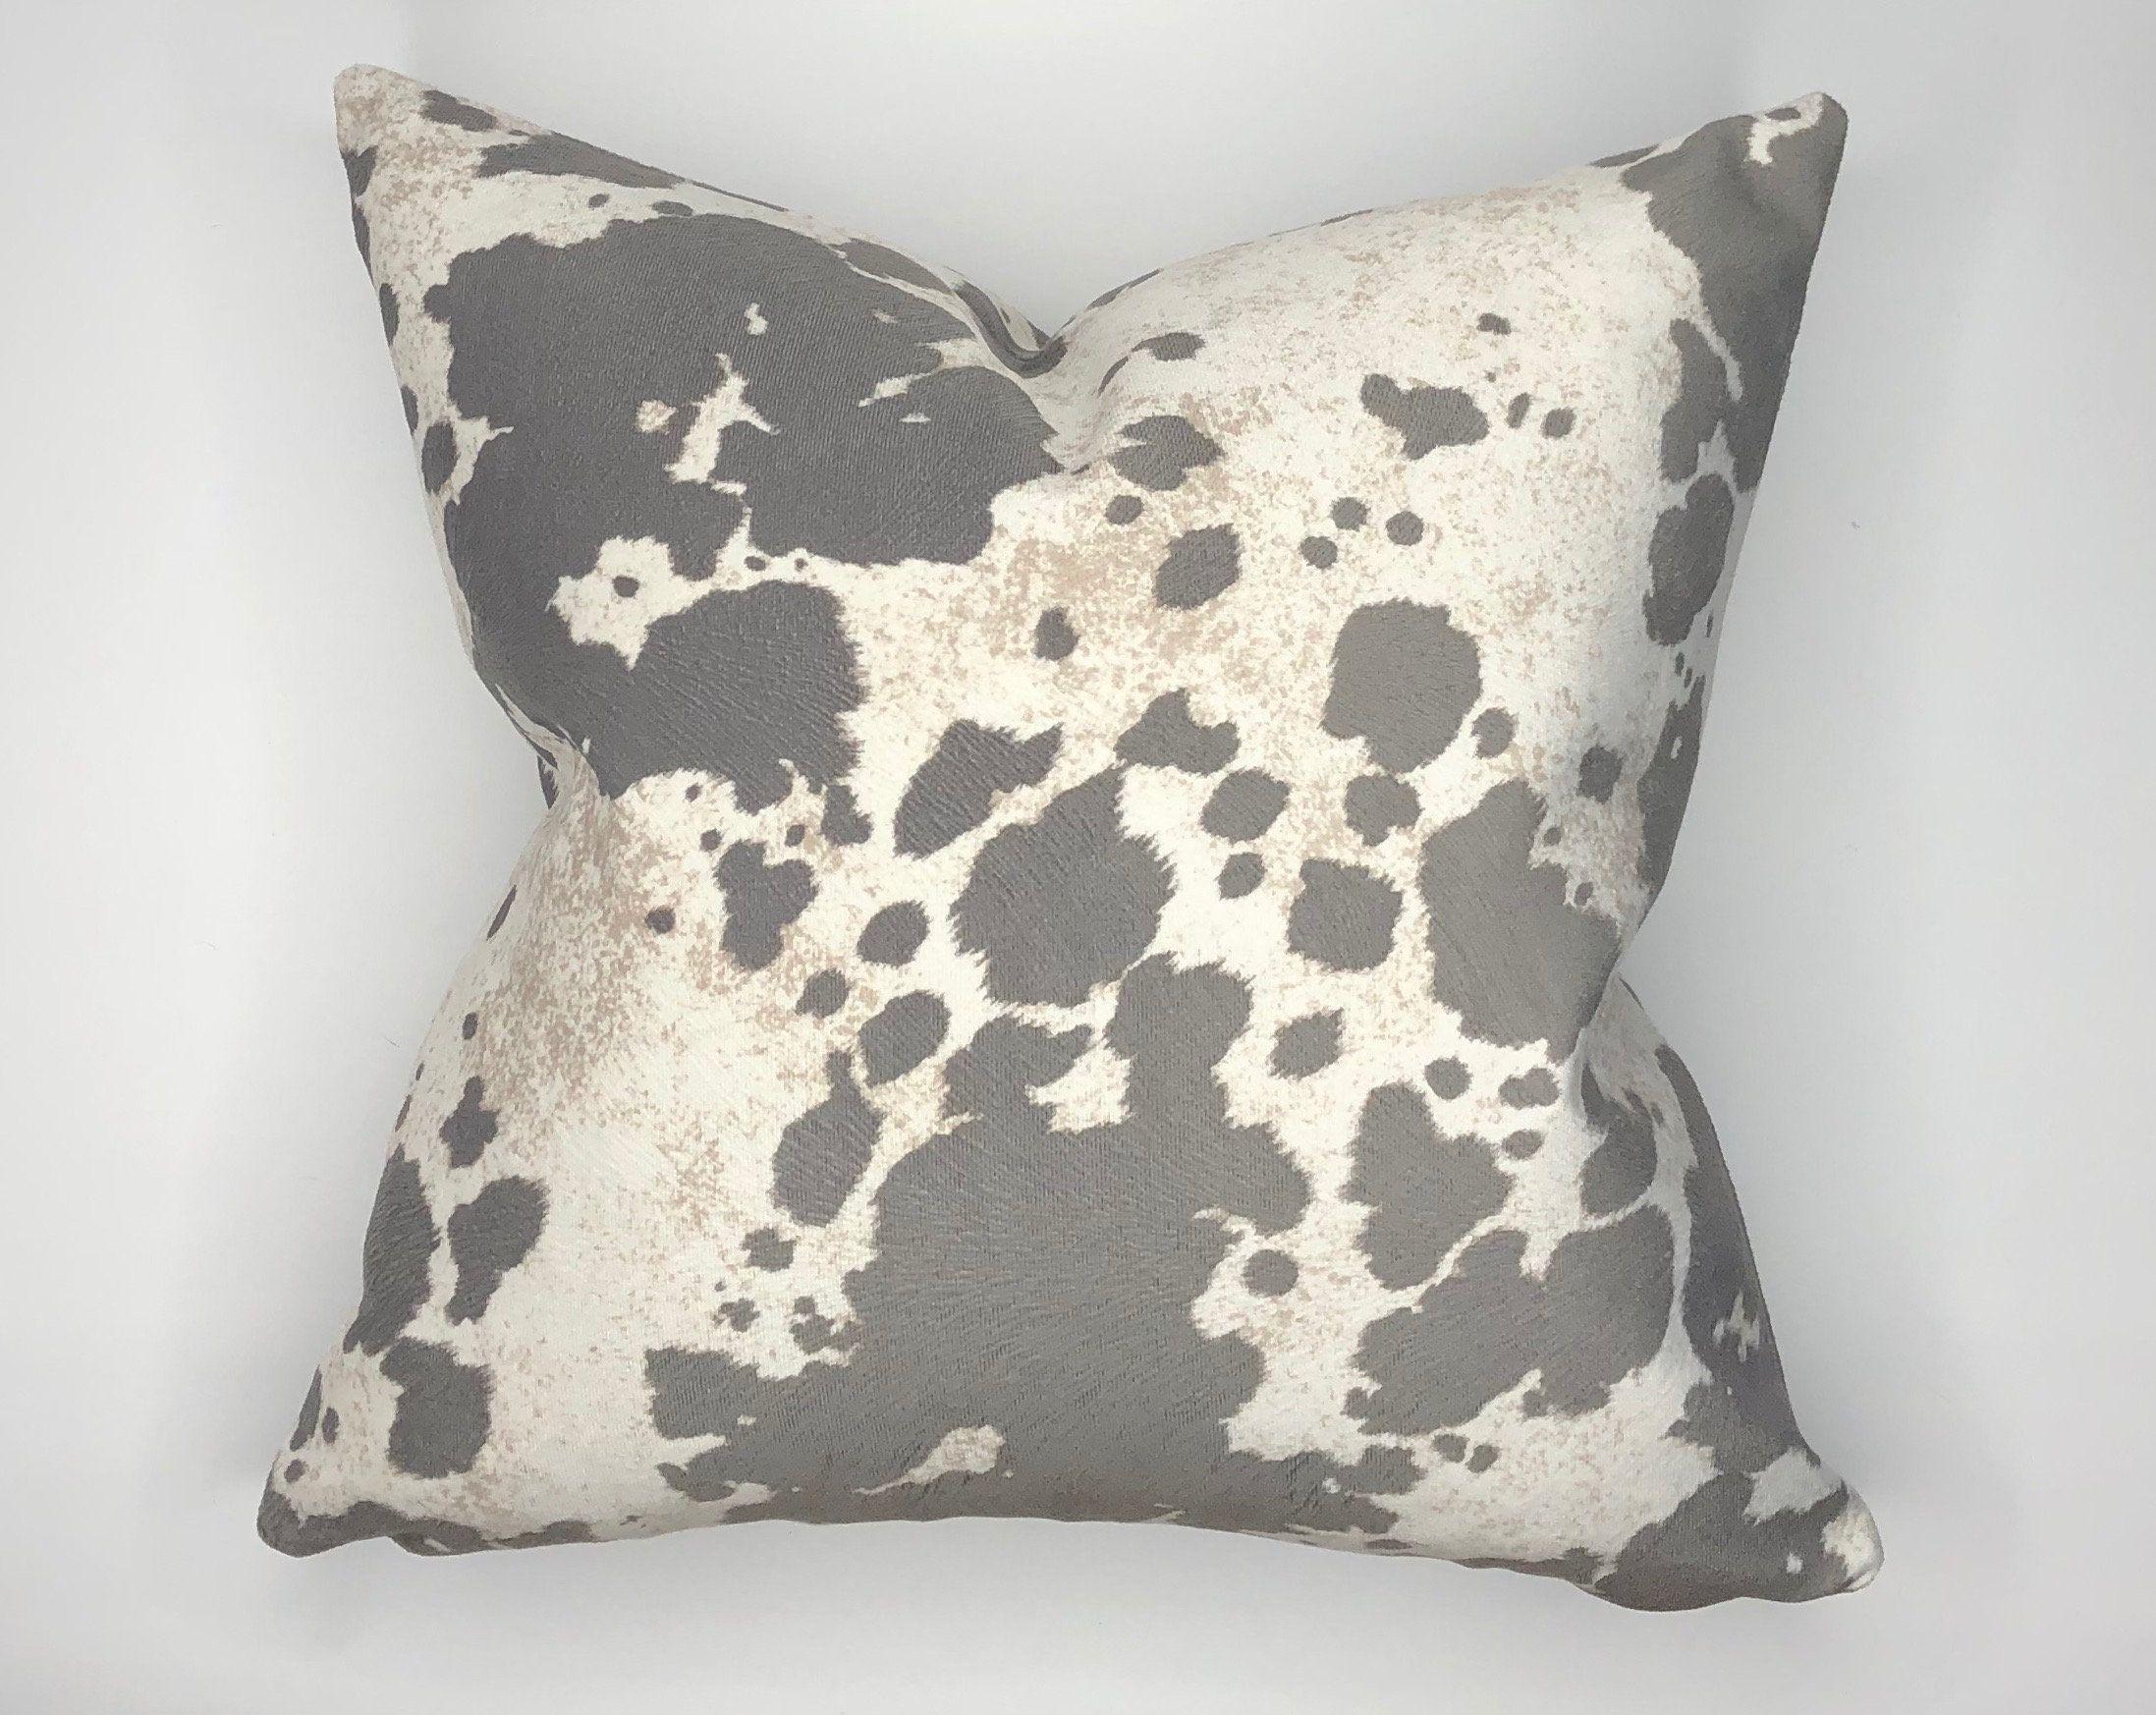 "Animal Print Throw Pillow | Accent Pillow | Decorative Throw Pillow | Cow Pillow Cover | Gray and White Throw Pillow | 18"" Pillow Cover"